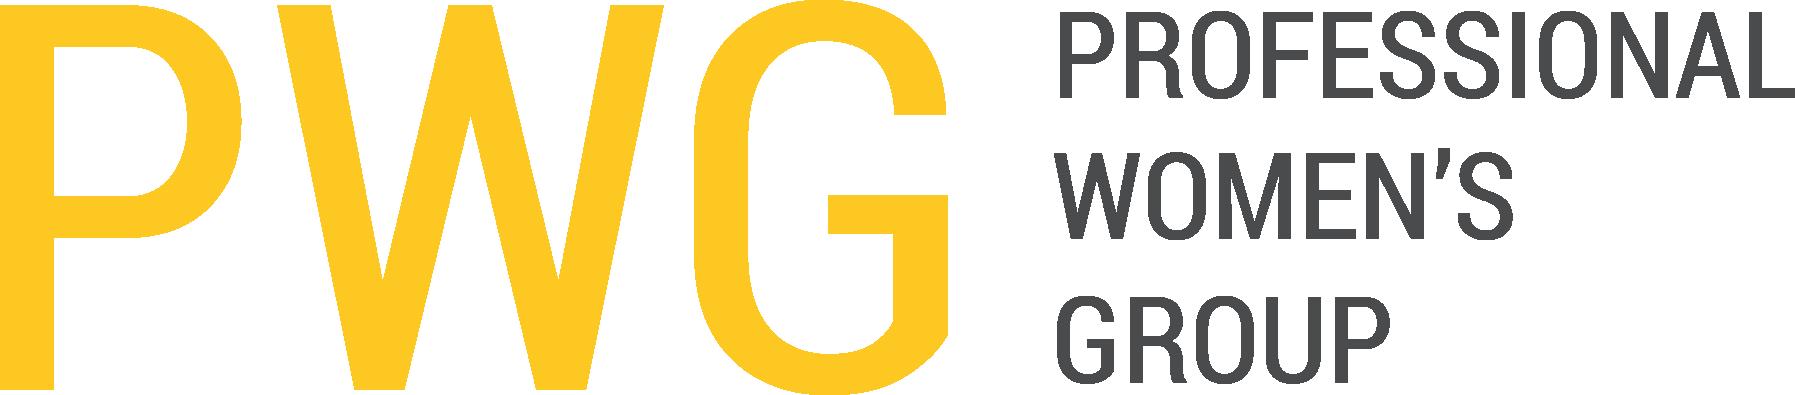 PWG_Logo_2015_15_RE-2.png